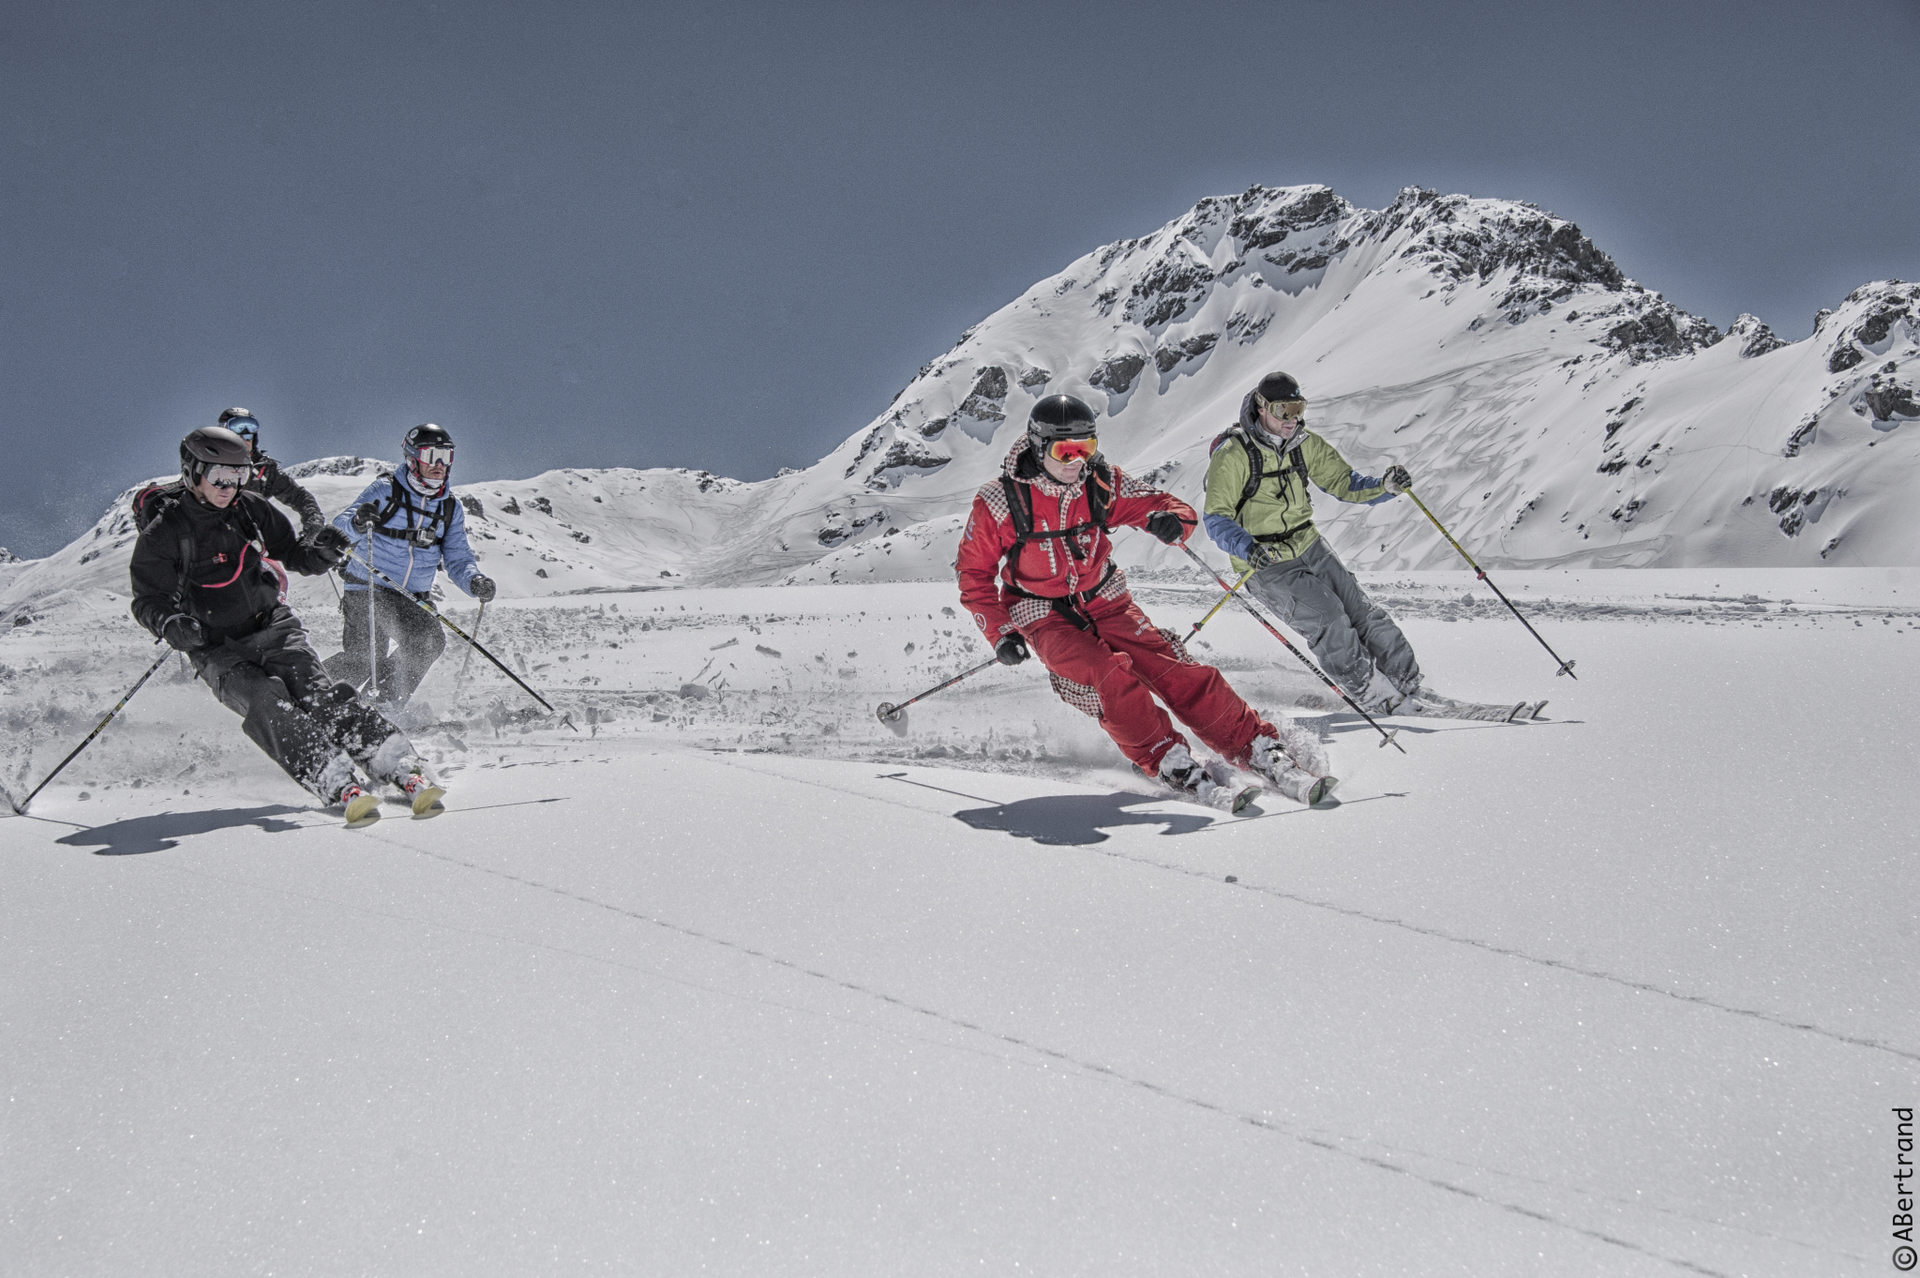 Ski, Fun and Good mood for the Apotheose Days